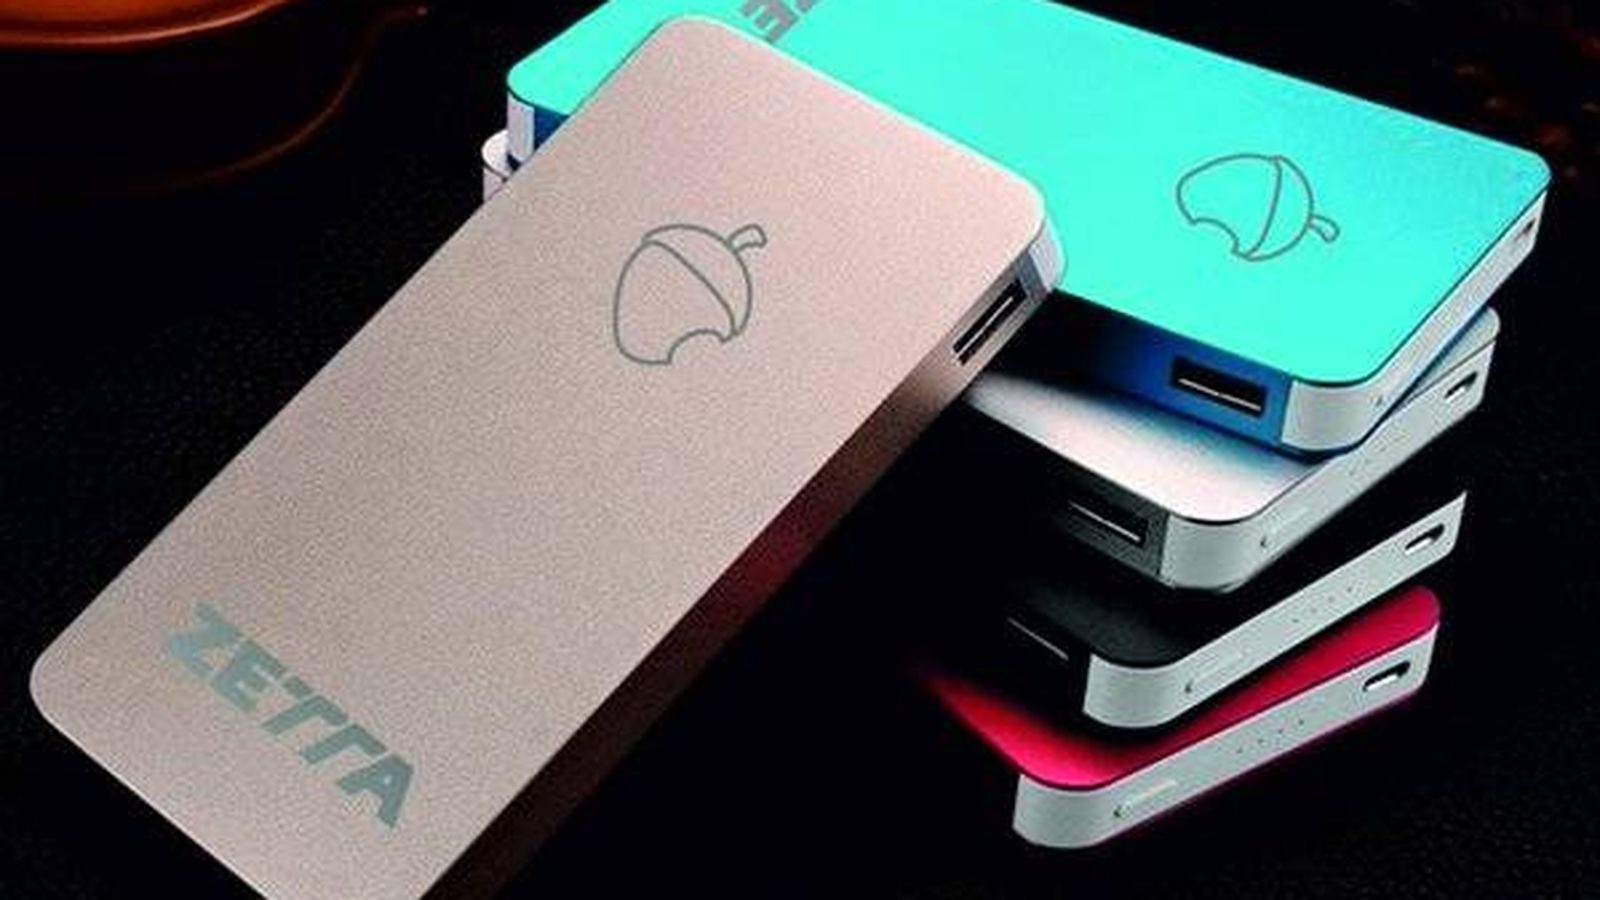 e08b081bec3 Smartphones: El fraude del iPhone extremeño Zetta que en realidad es un  móvil chino de Xiaomi